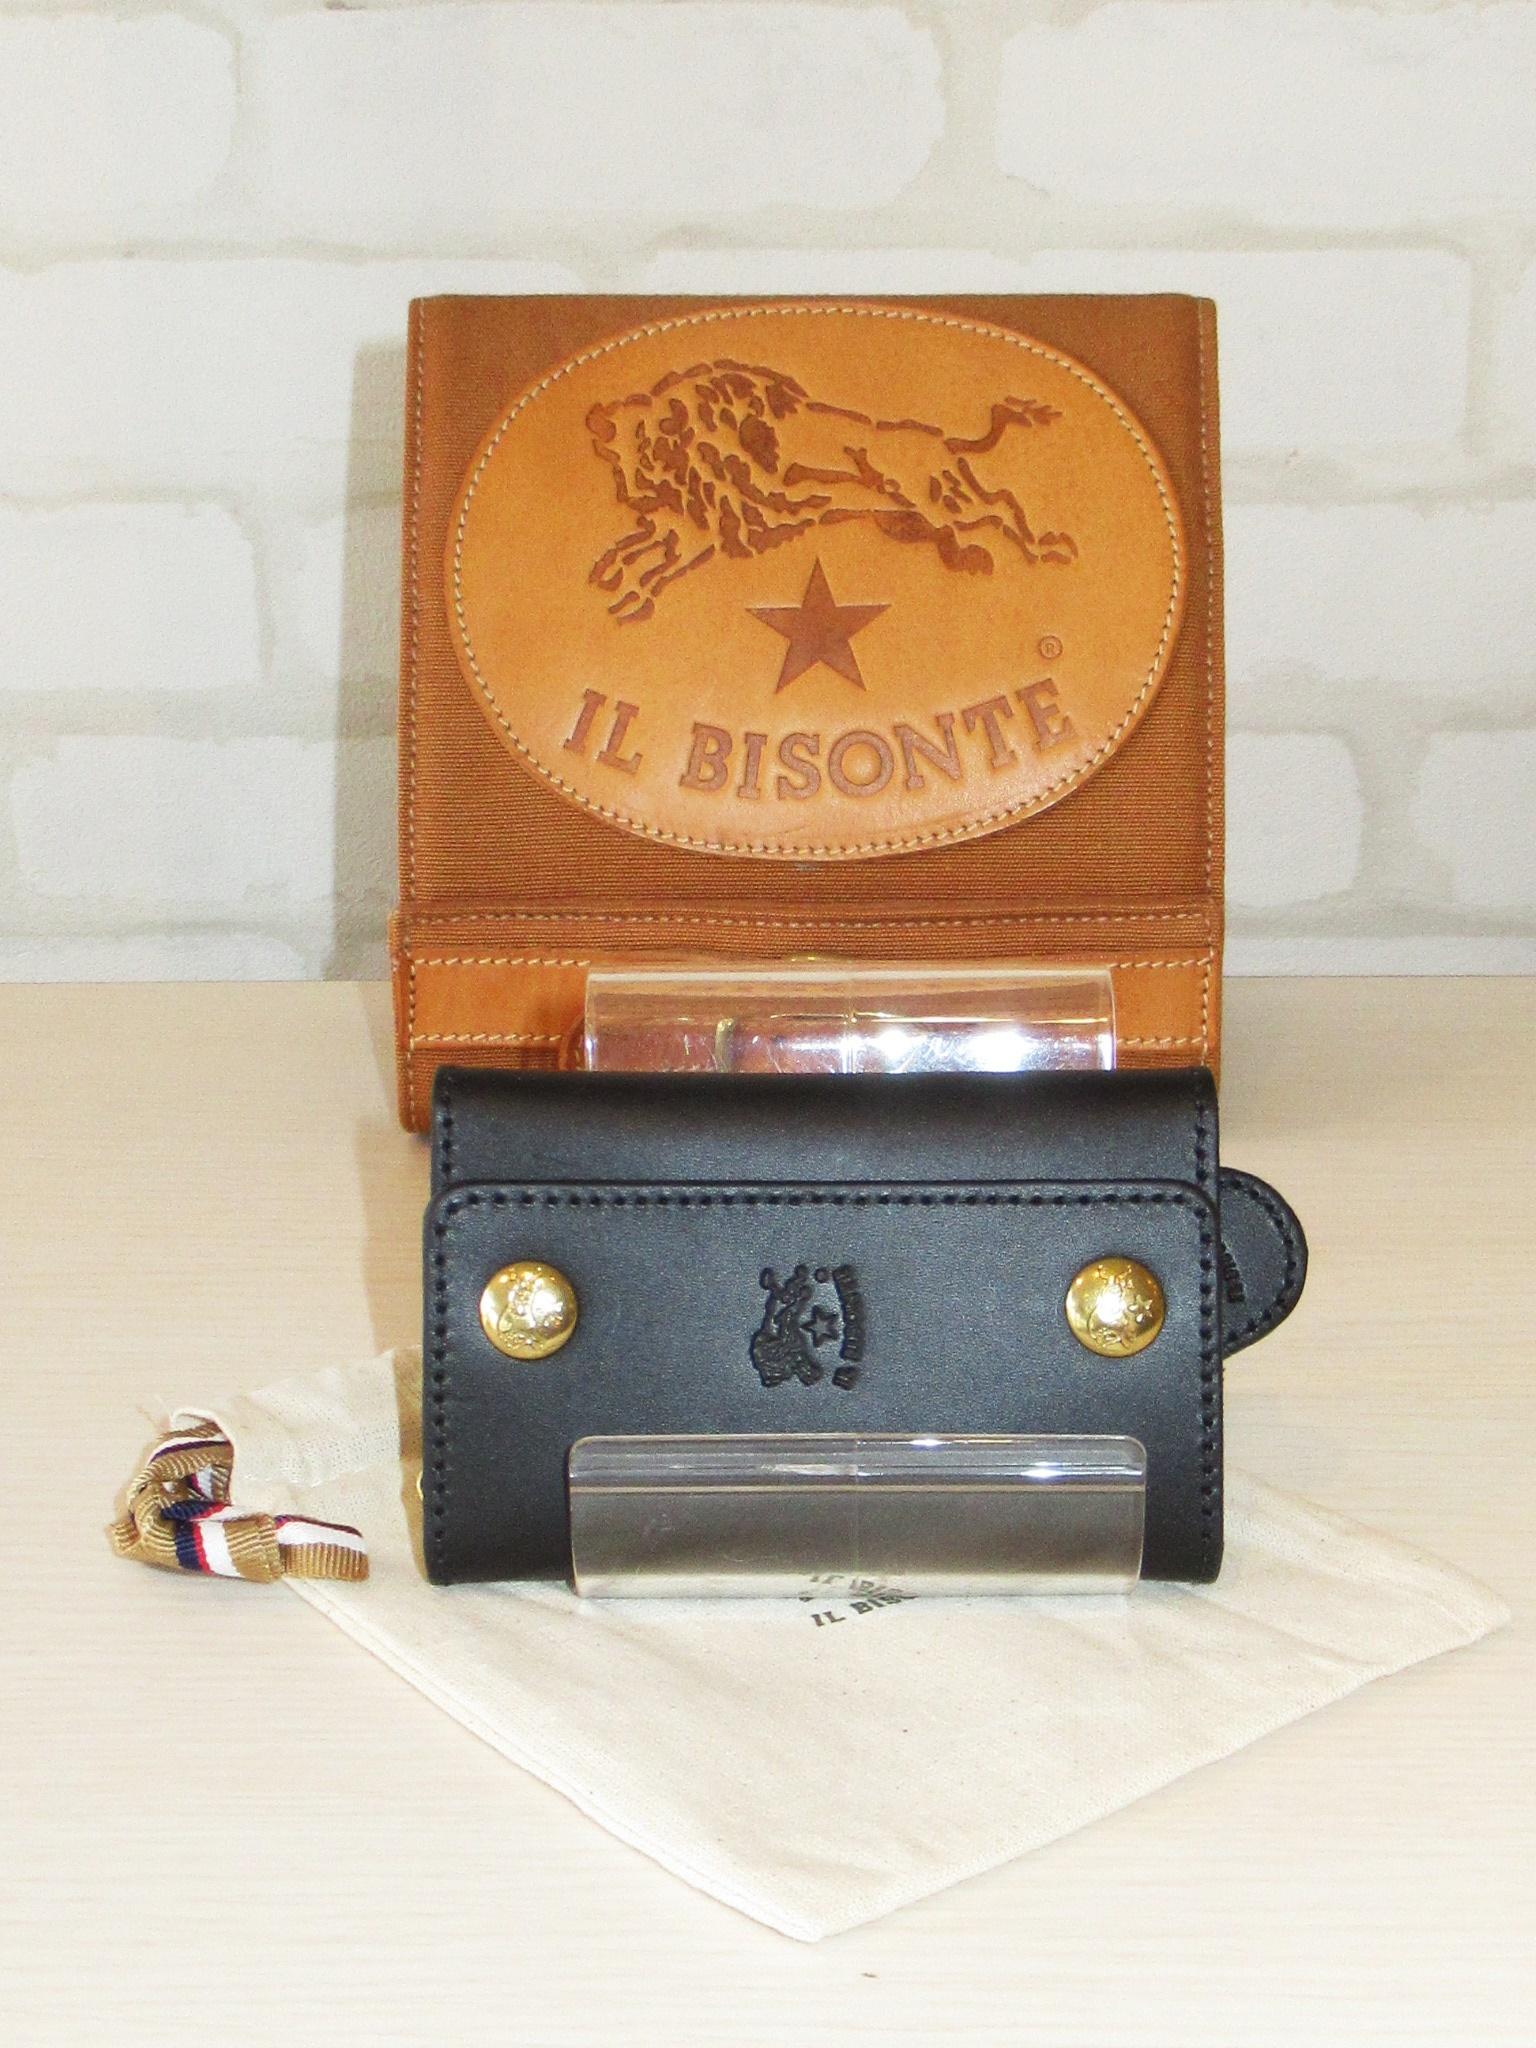 IL BISONTE(イルビゾンテ)/6連キーケース/9290(ブラック)